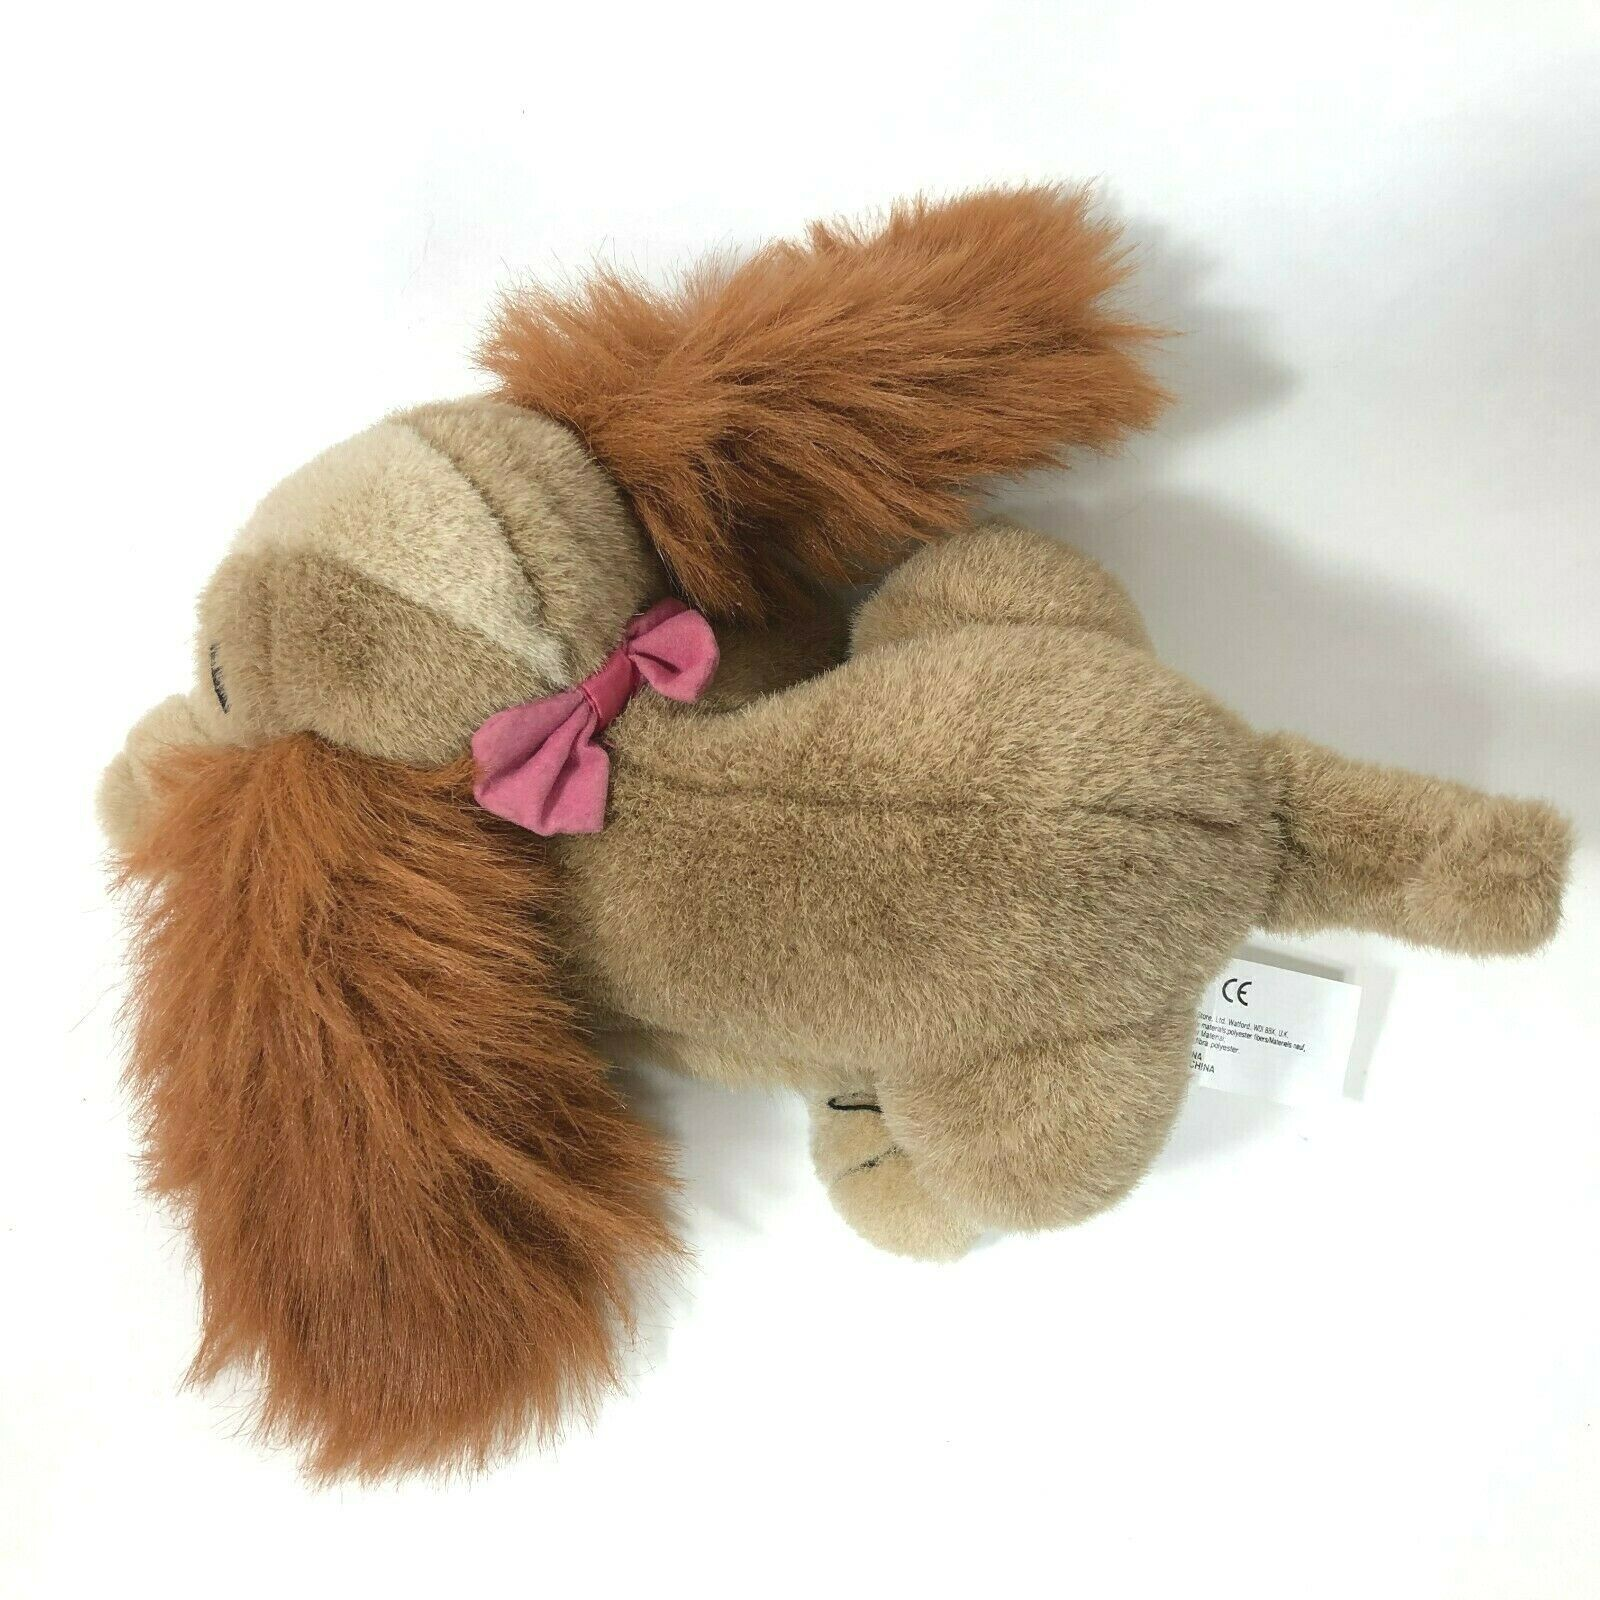 "Disney LADY and the Tramp 10"" Plush Stuffed Animal Pink Bow Vintage image 5"